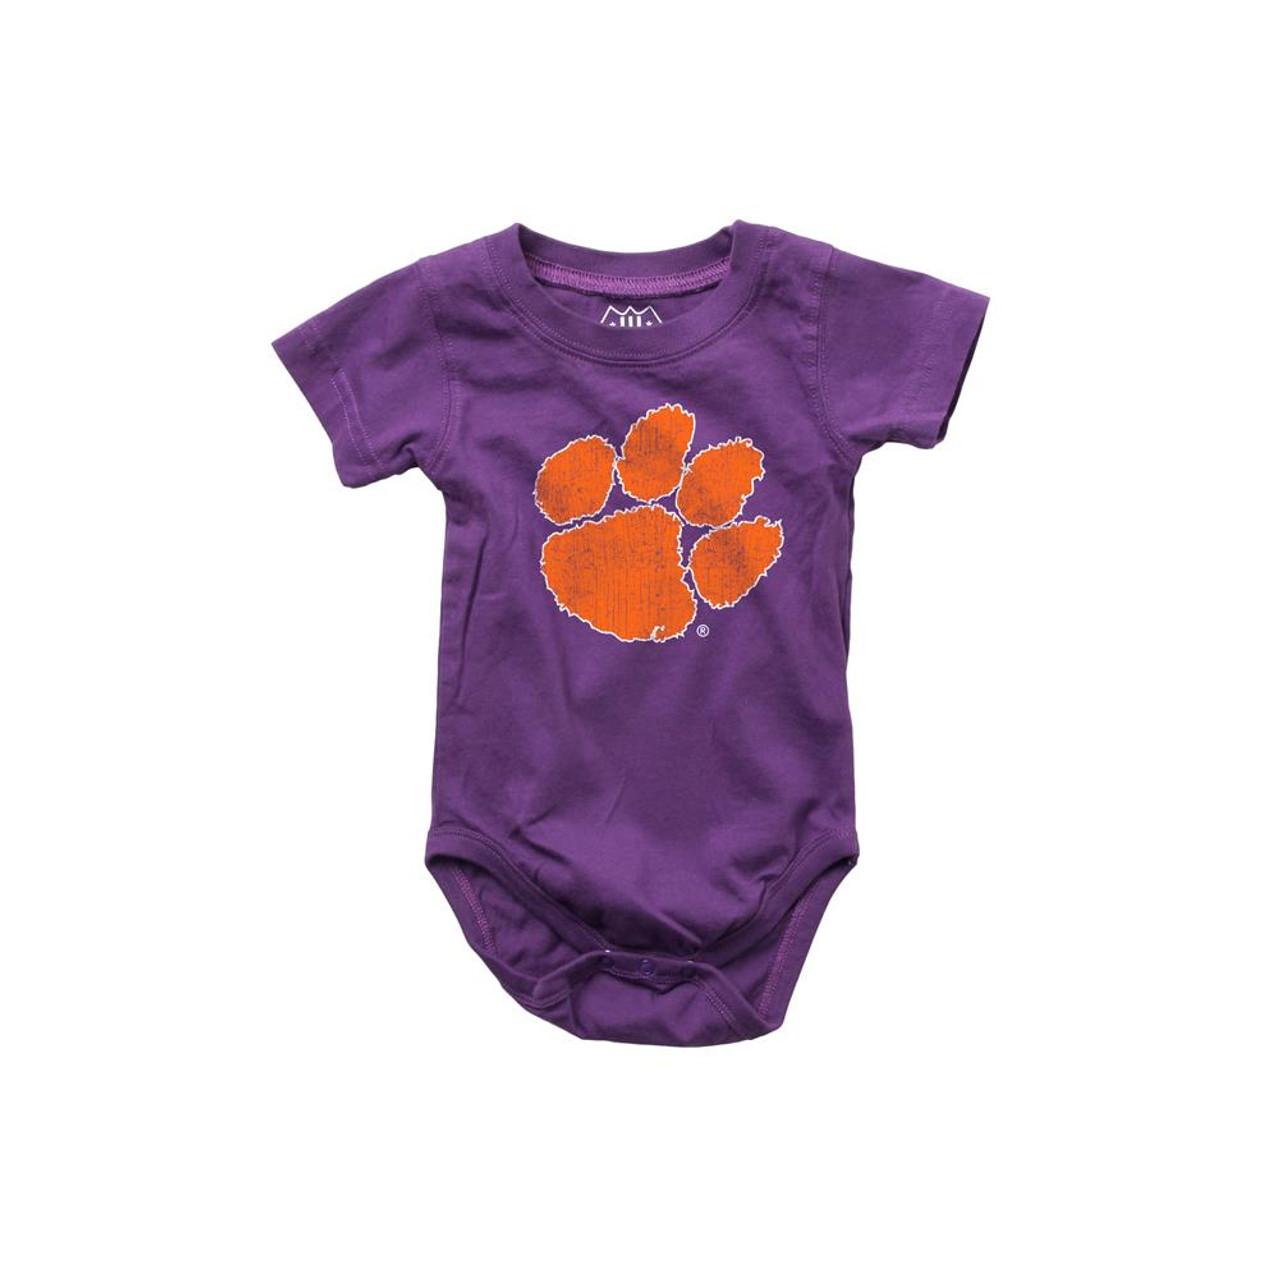 Infant Clemson University Tigers Bodysuits 3 Pack Organic Cotton Set